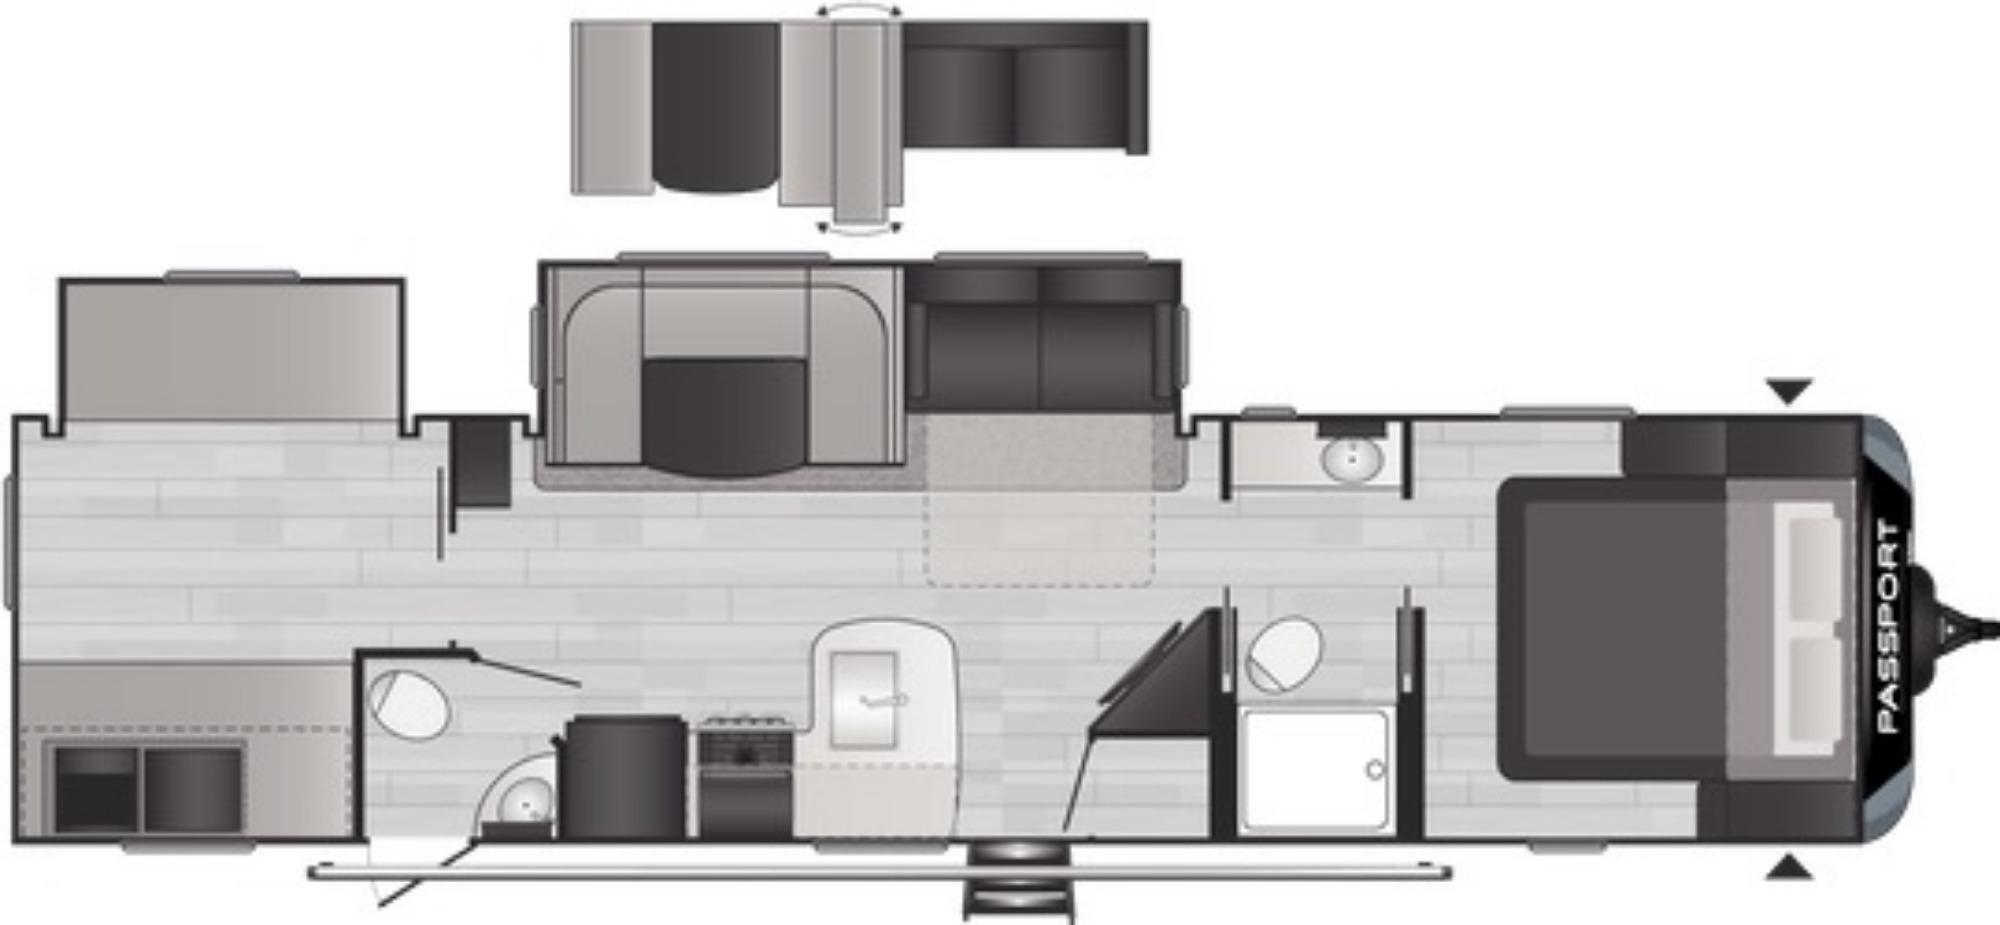 View Floor Plan for 2021 KEYSTONE PASSPORT 3352BH